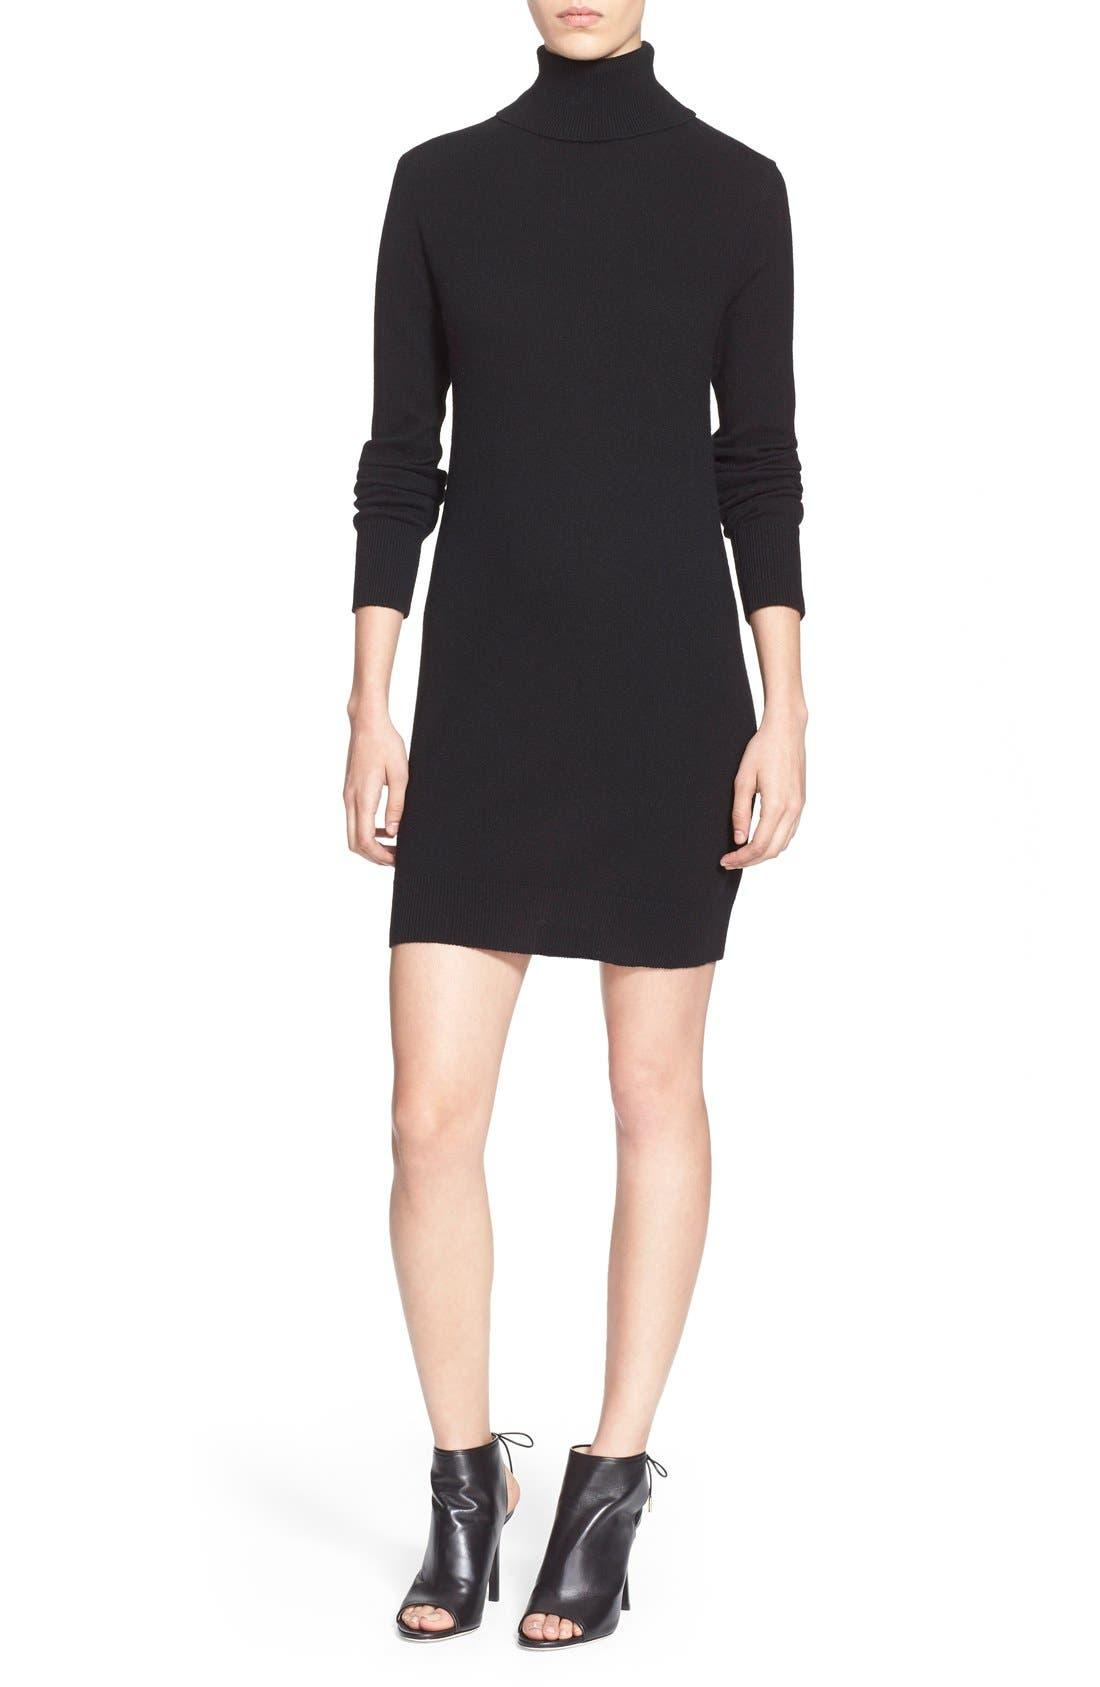 Main Image - Equipment 'Oscar' Turtleneck Sweater Dress